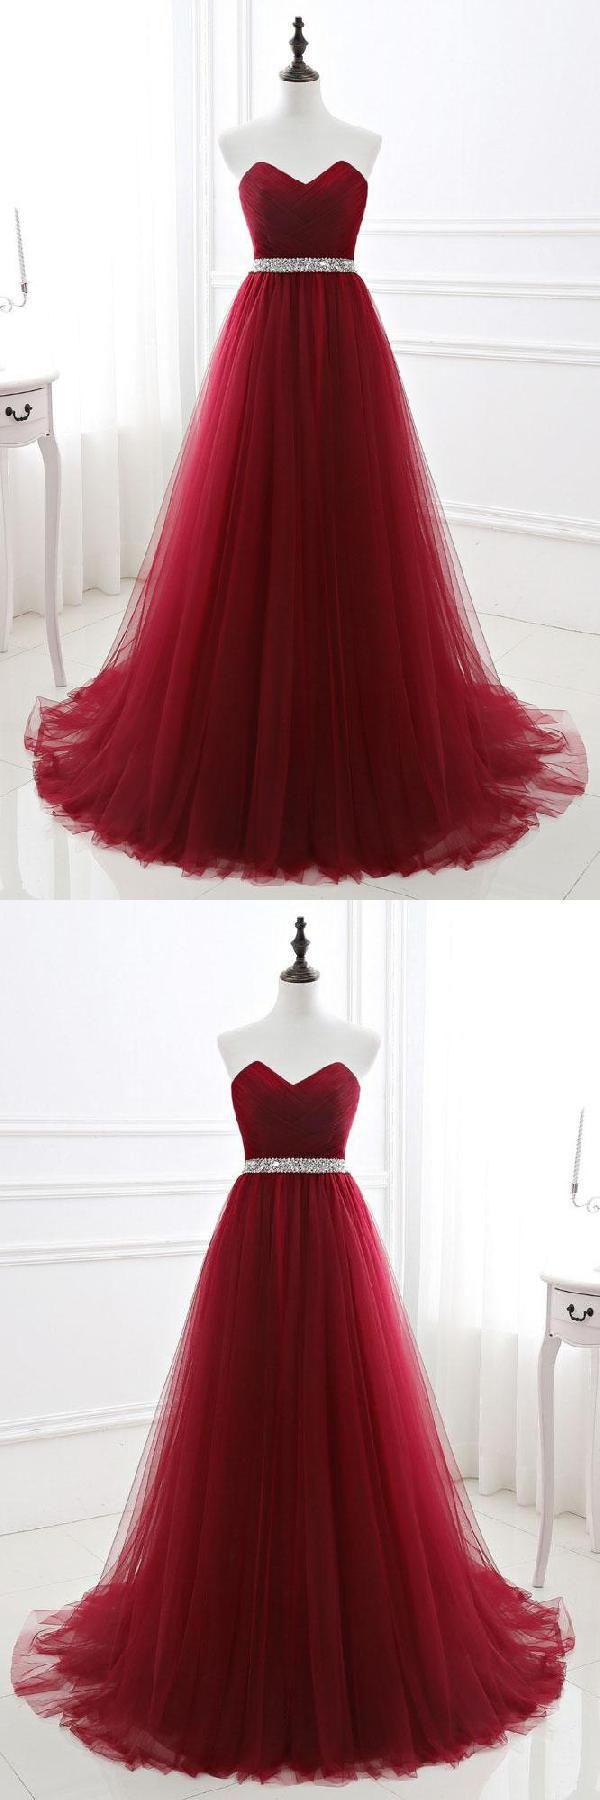 Long prom dresses burgundy prom dresses dress outfits